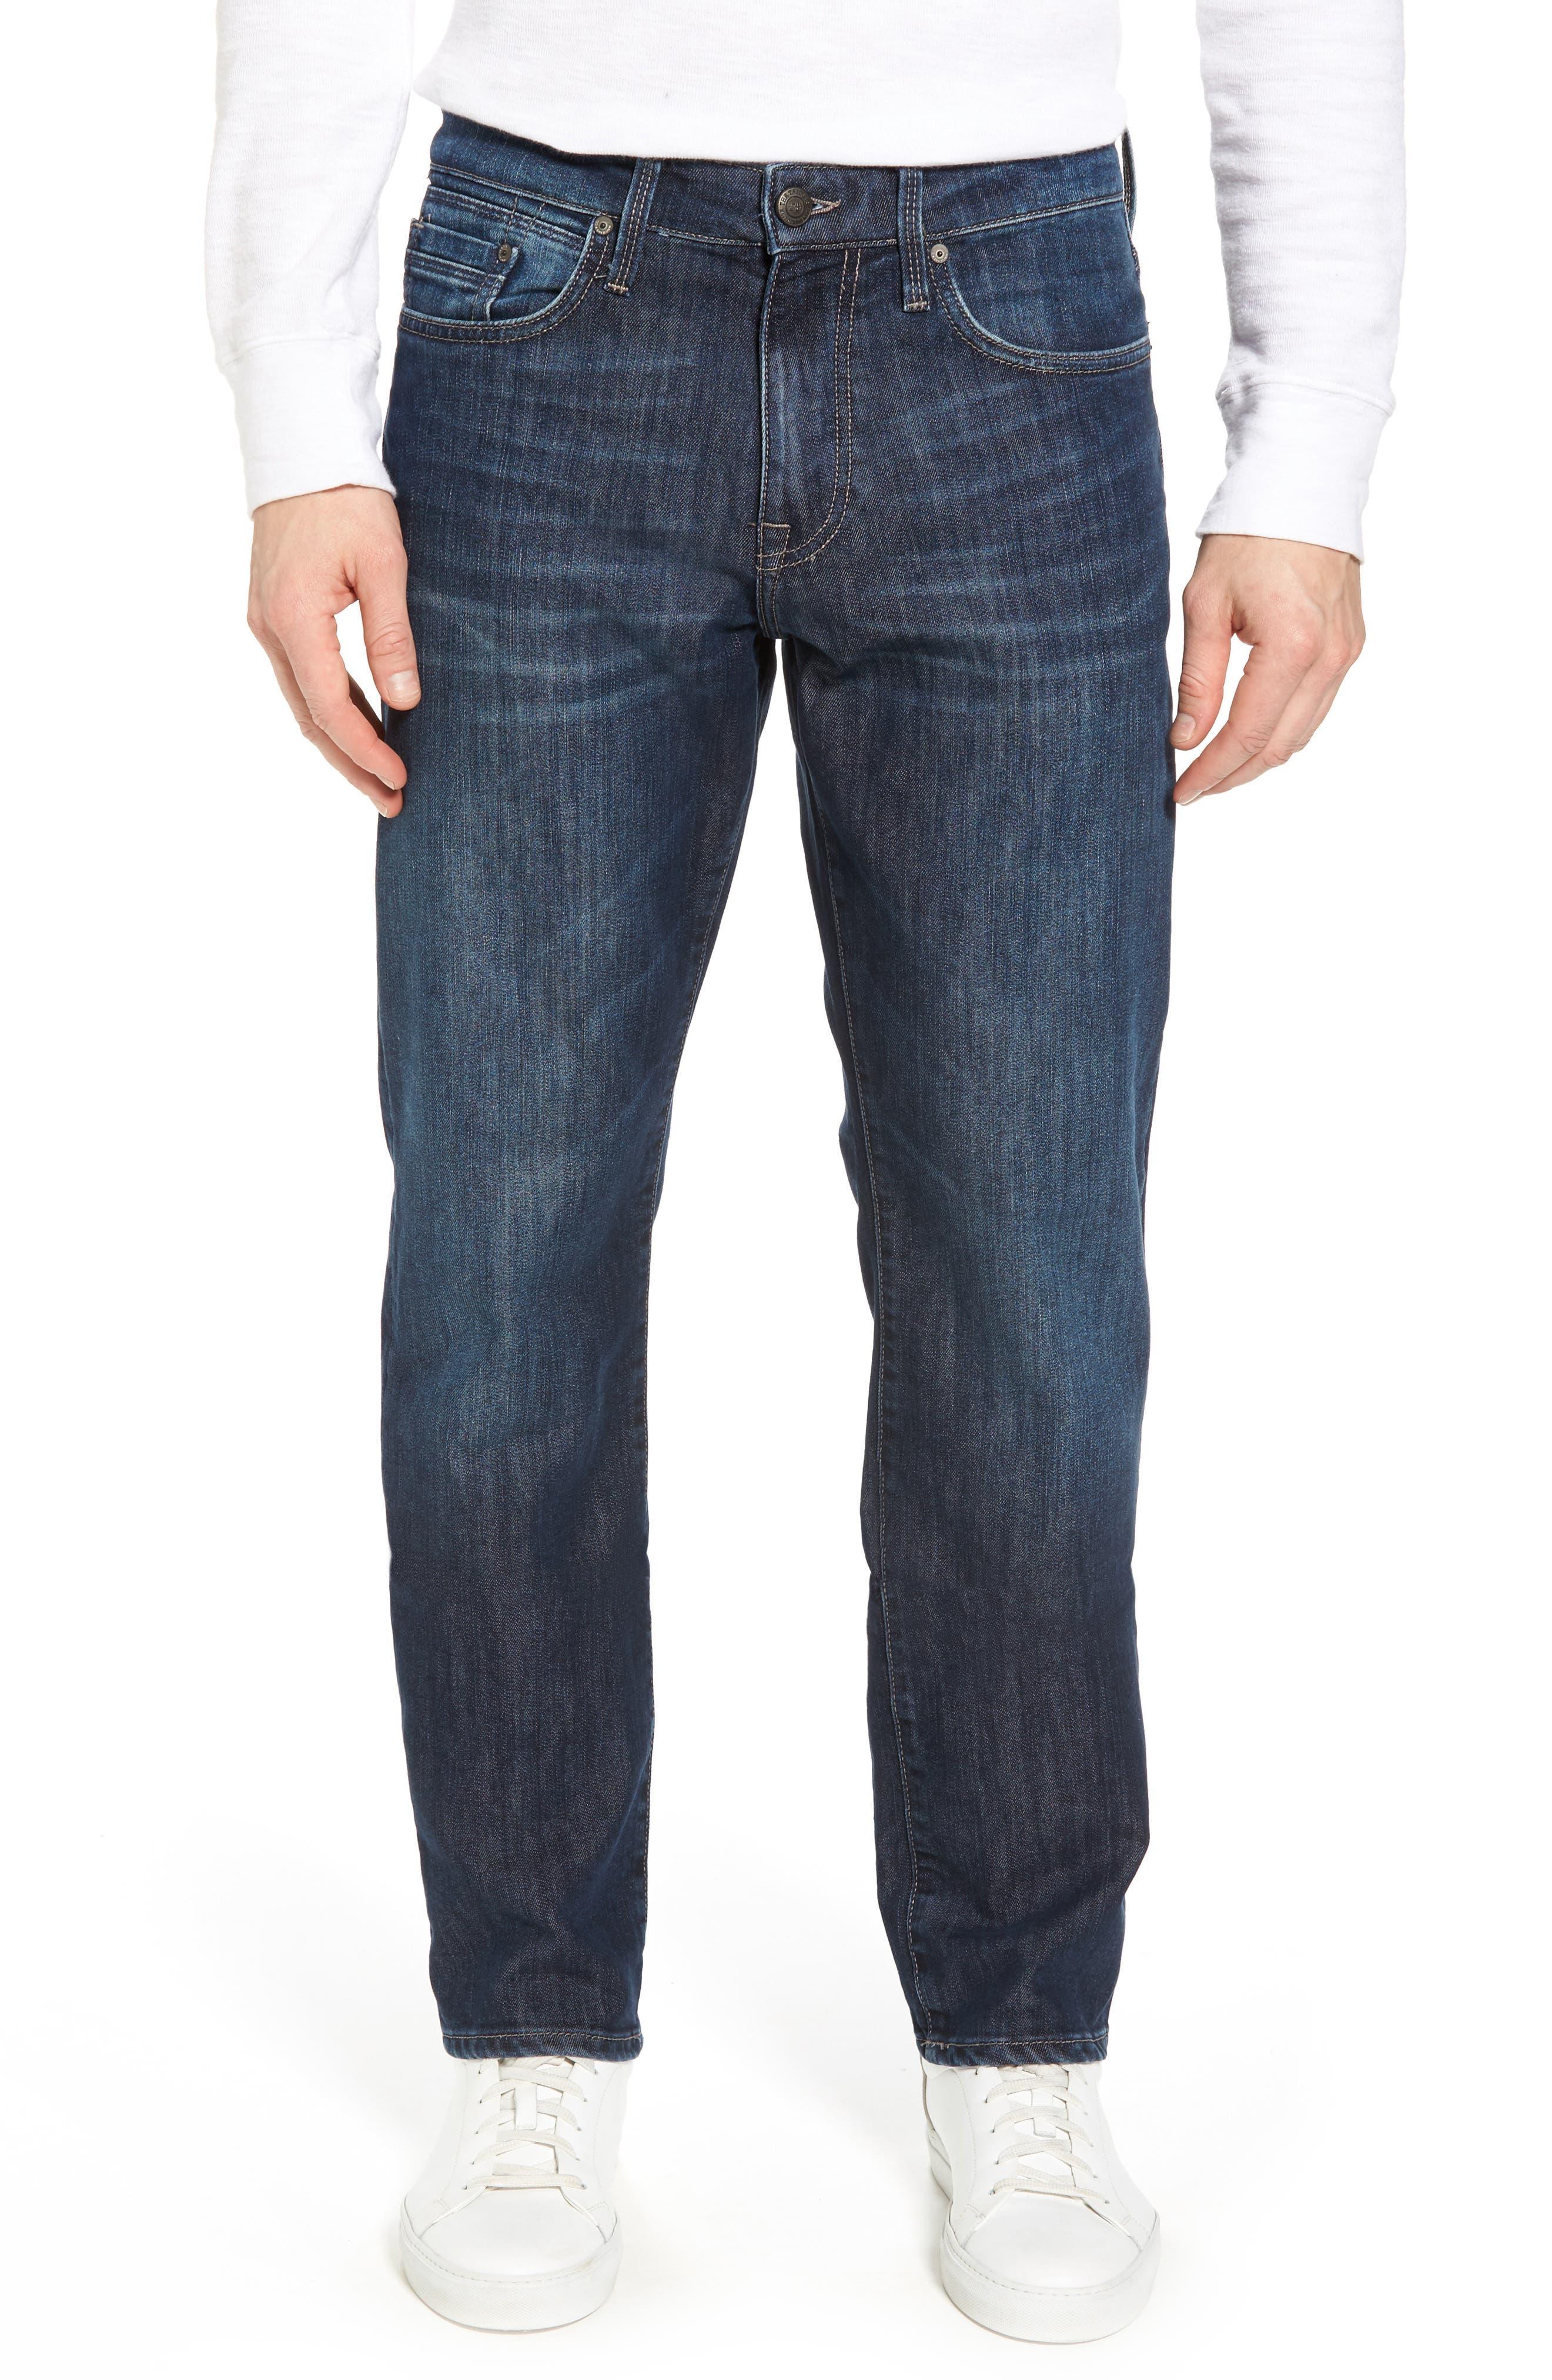 Myles Straight Leg Jeans,                         Main,                         color,